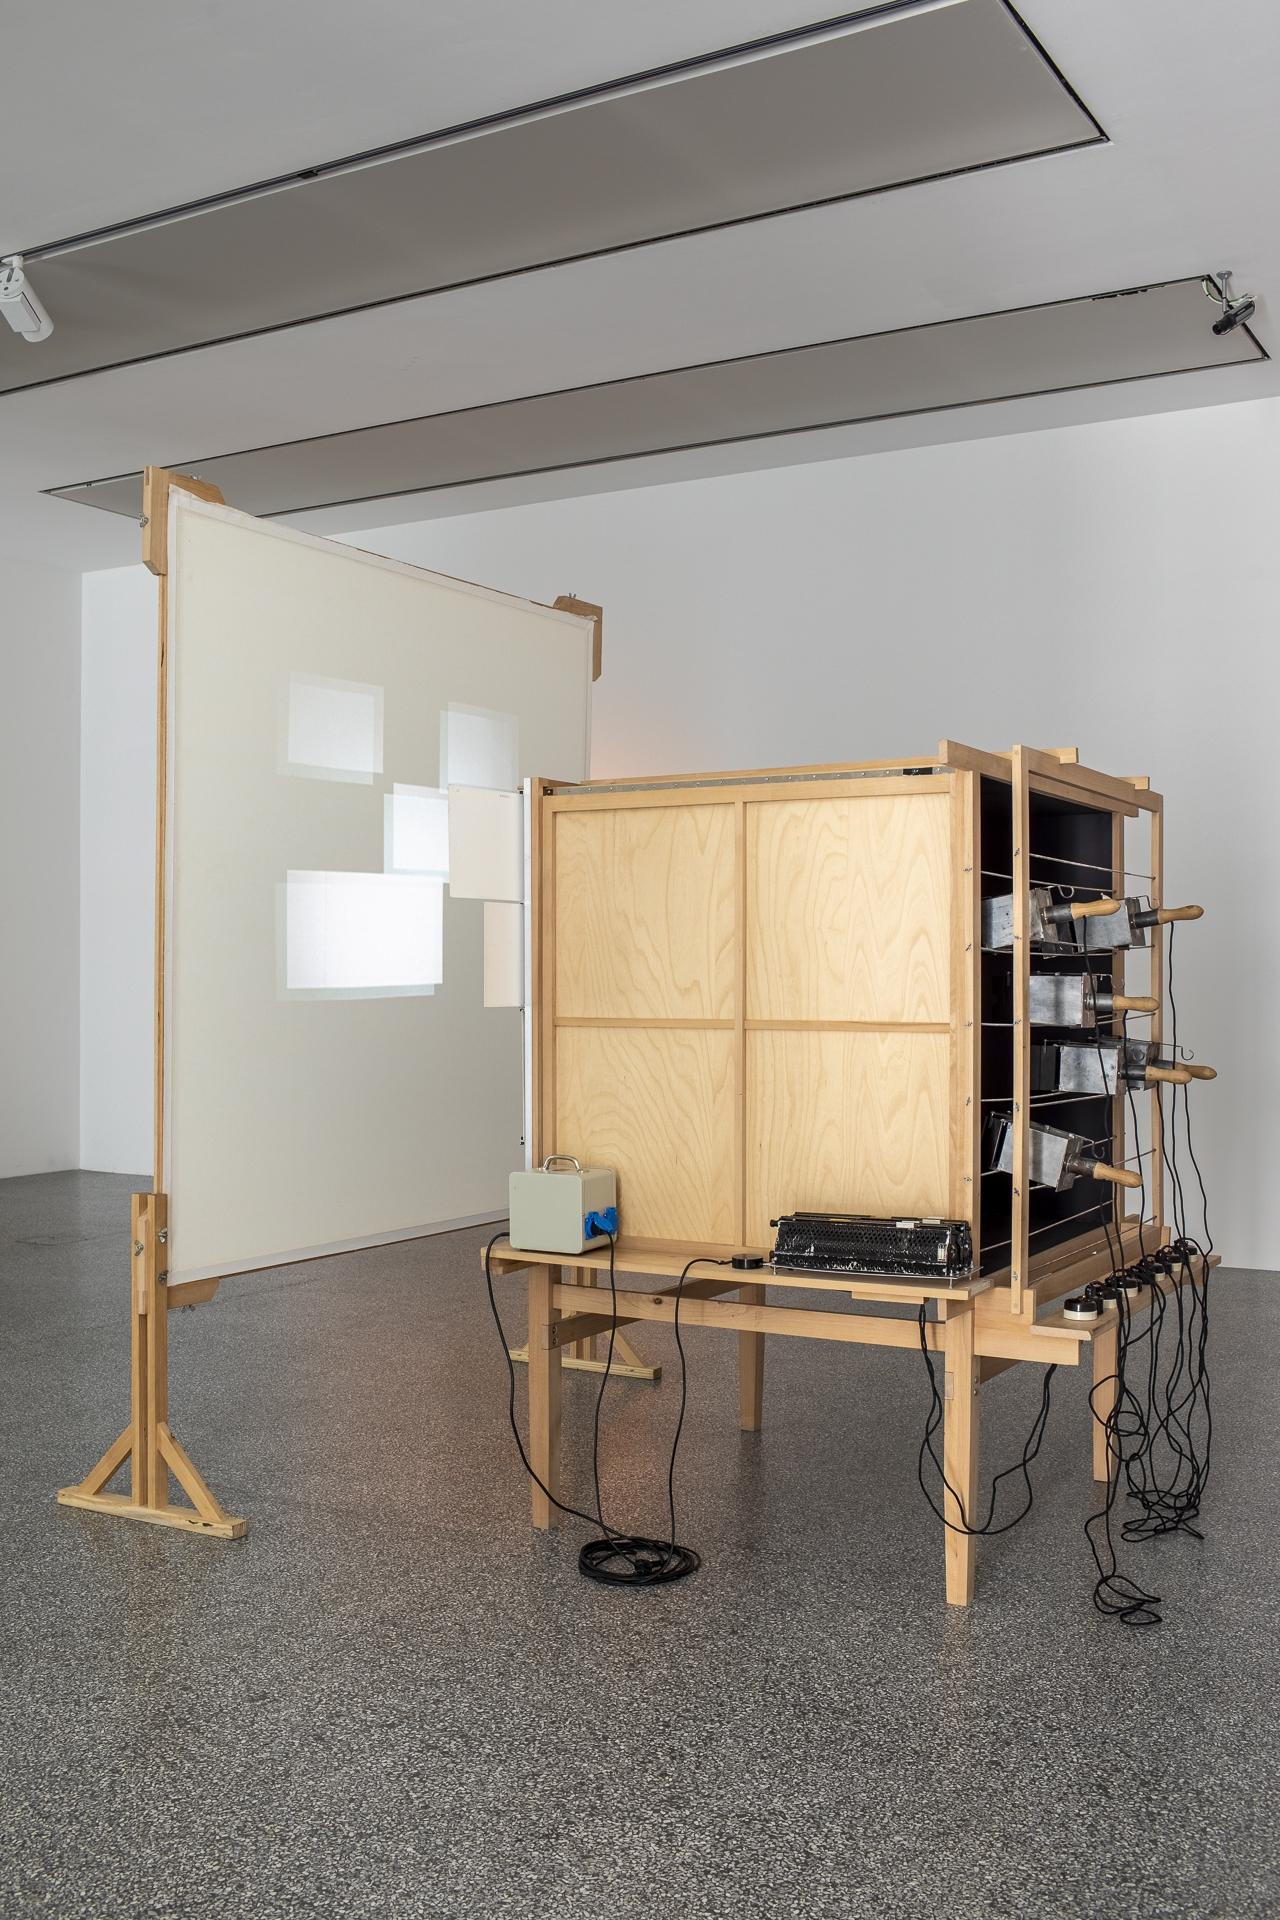 Claudia Polizzi Exhibition design, Ludwig Hirschfeld-Mack. Colored light plays, 2019